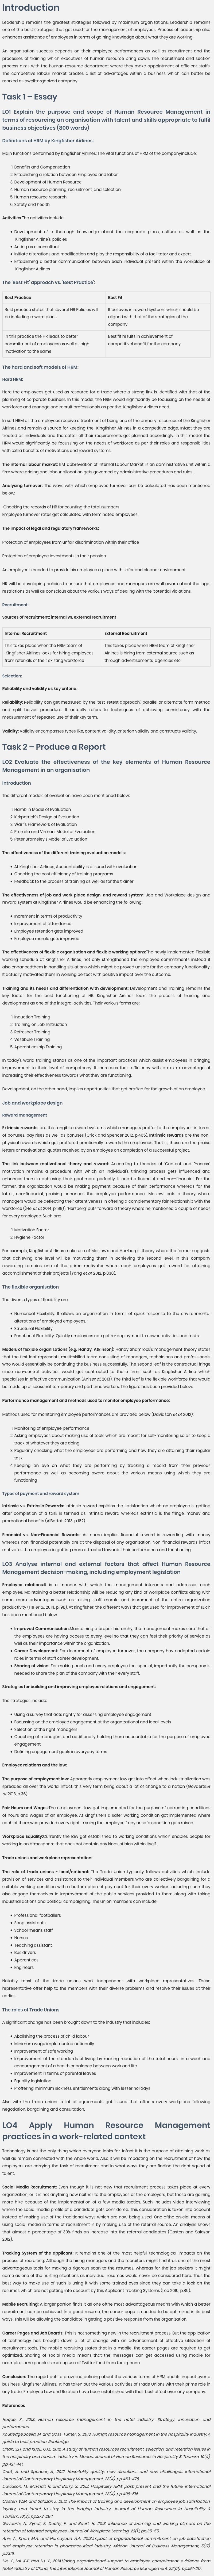 Unit 3 Human Resource Management Assignment Help